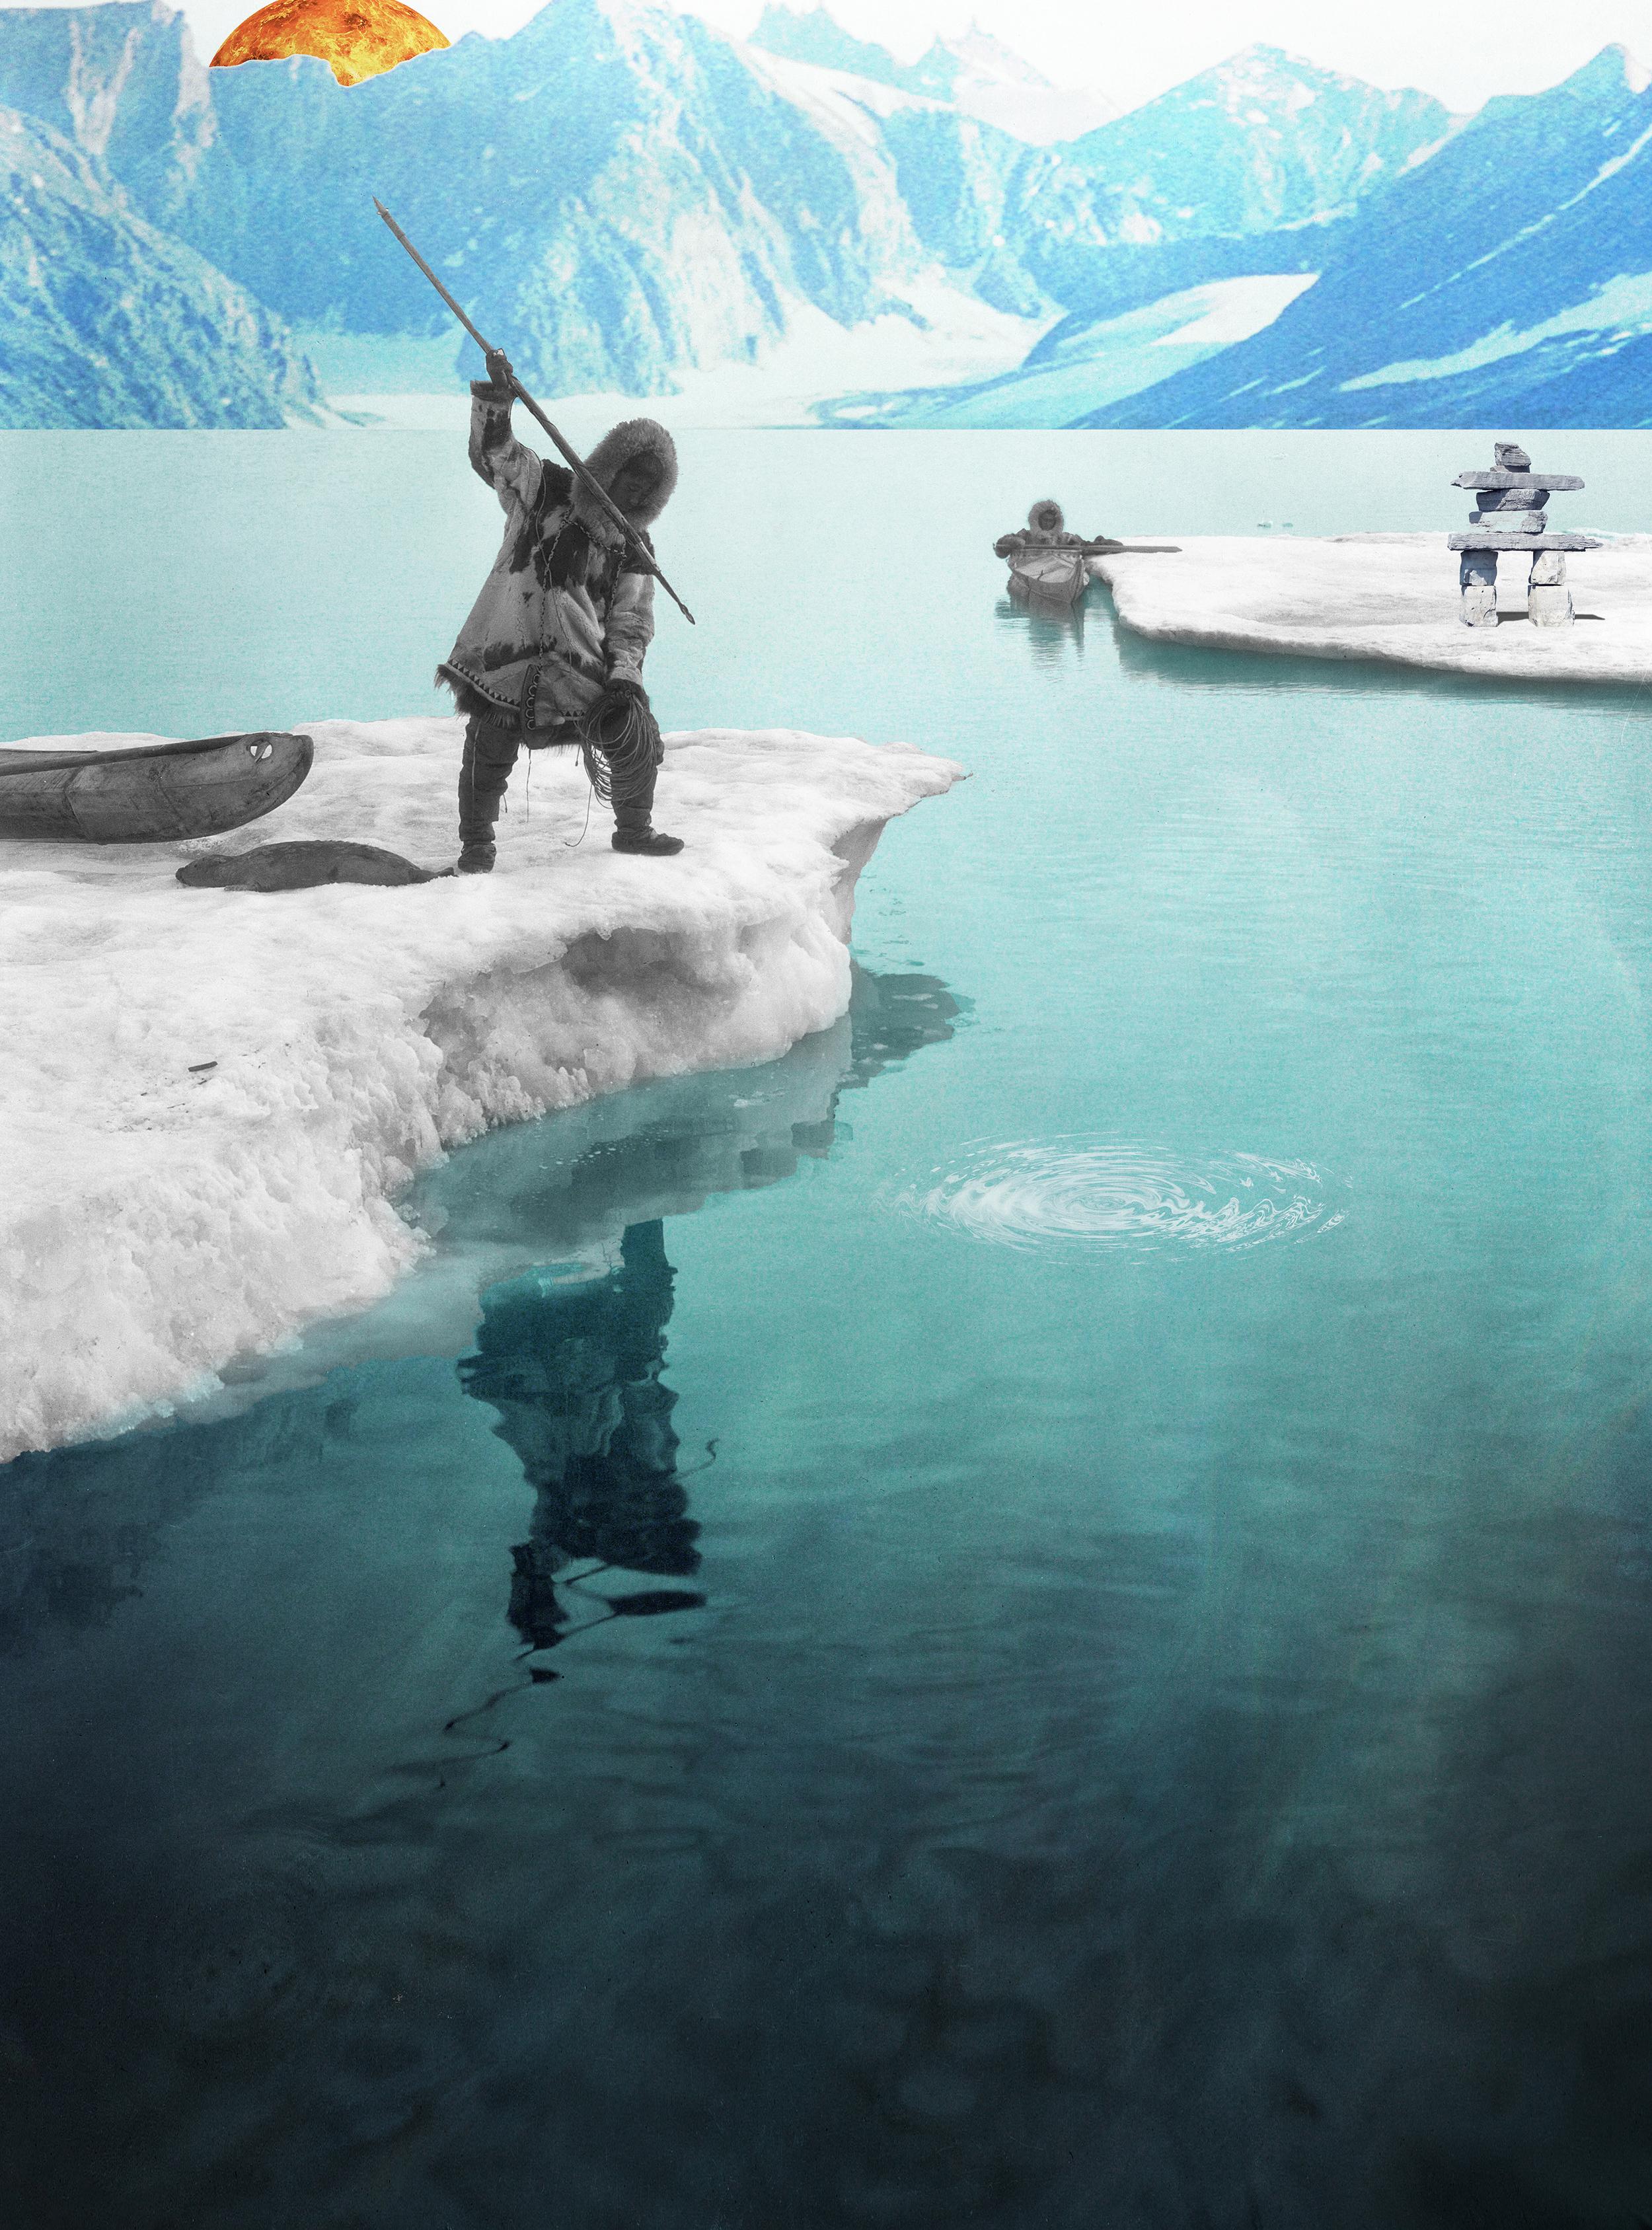 Jenkins, Cheyenne. Inuit. 2016. Digital Collage. Montreal, Quebec